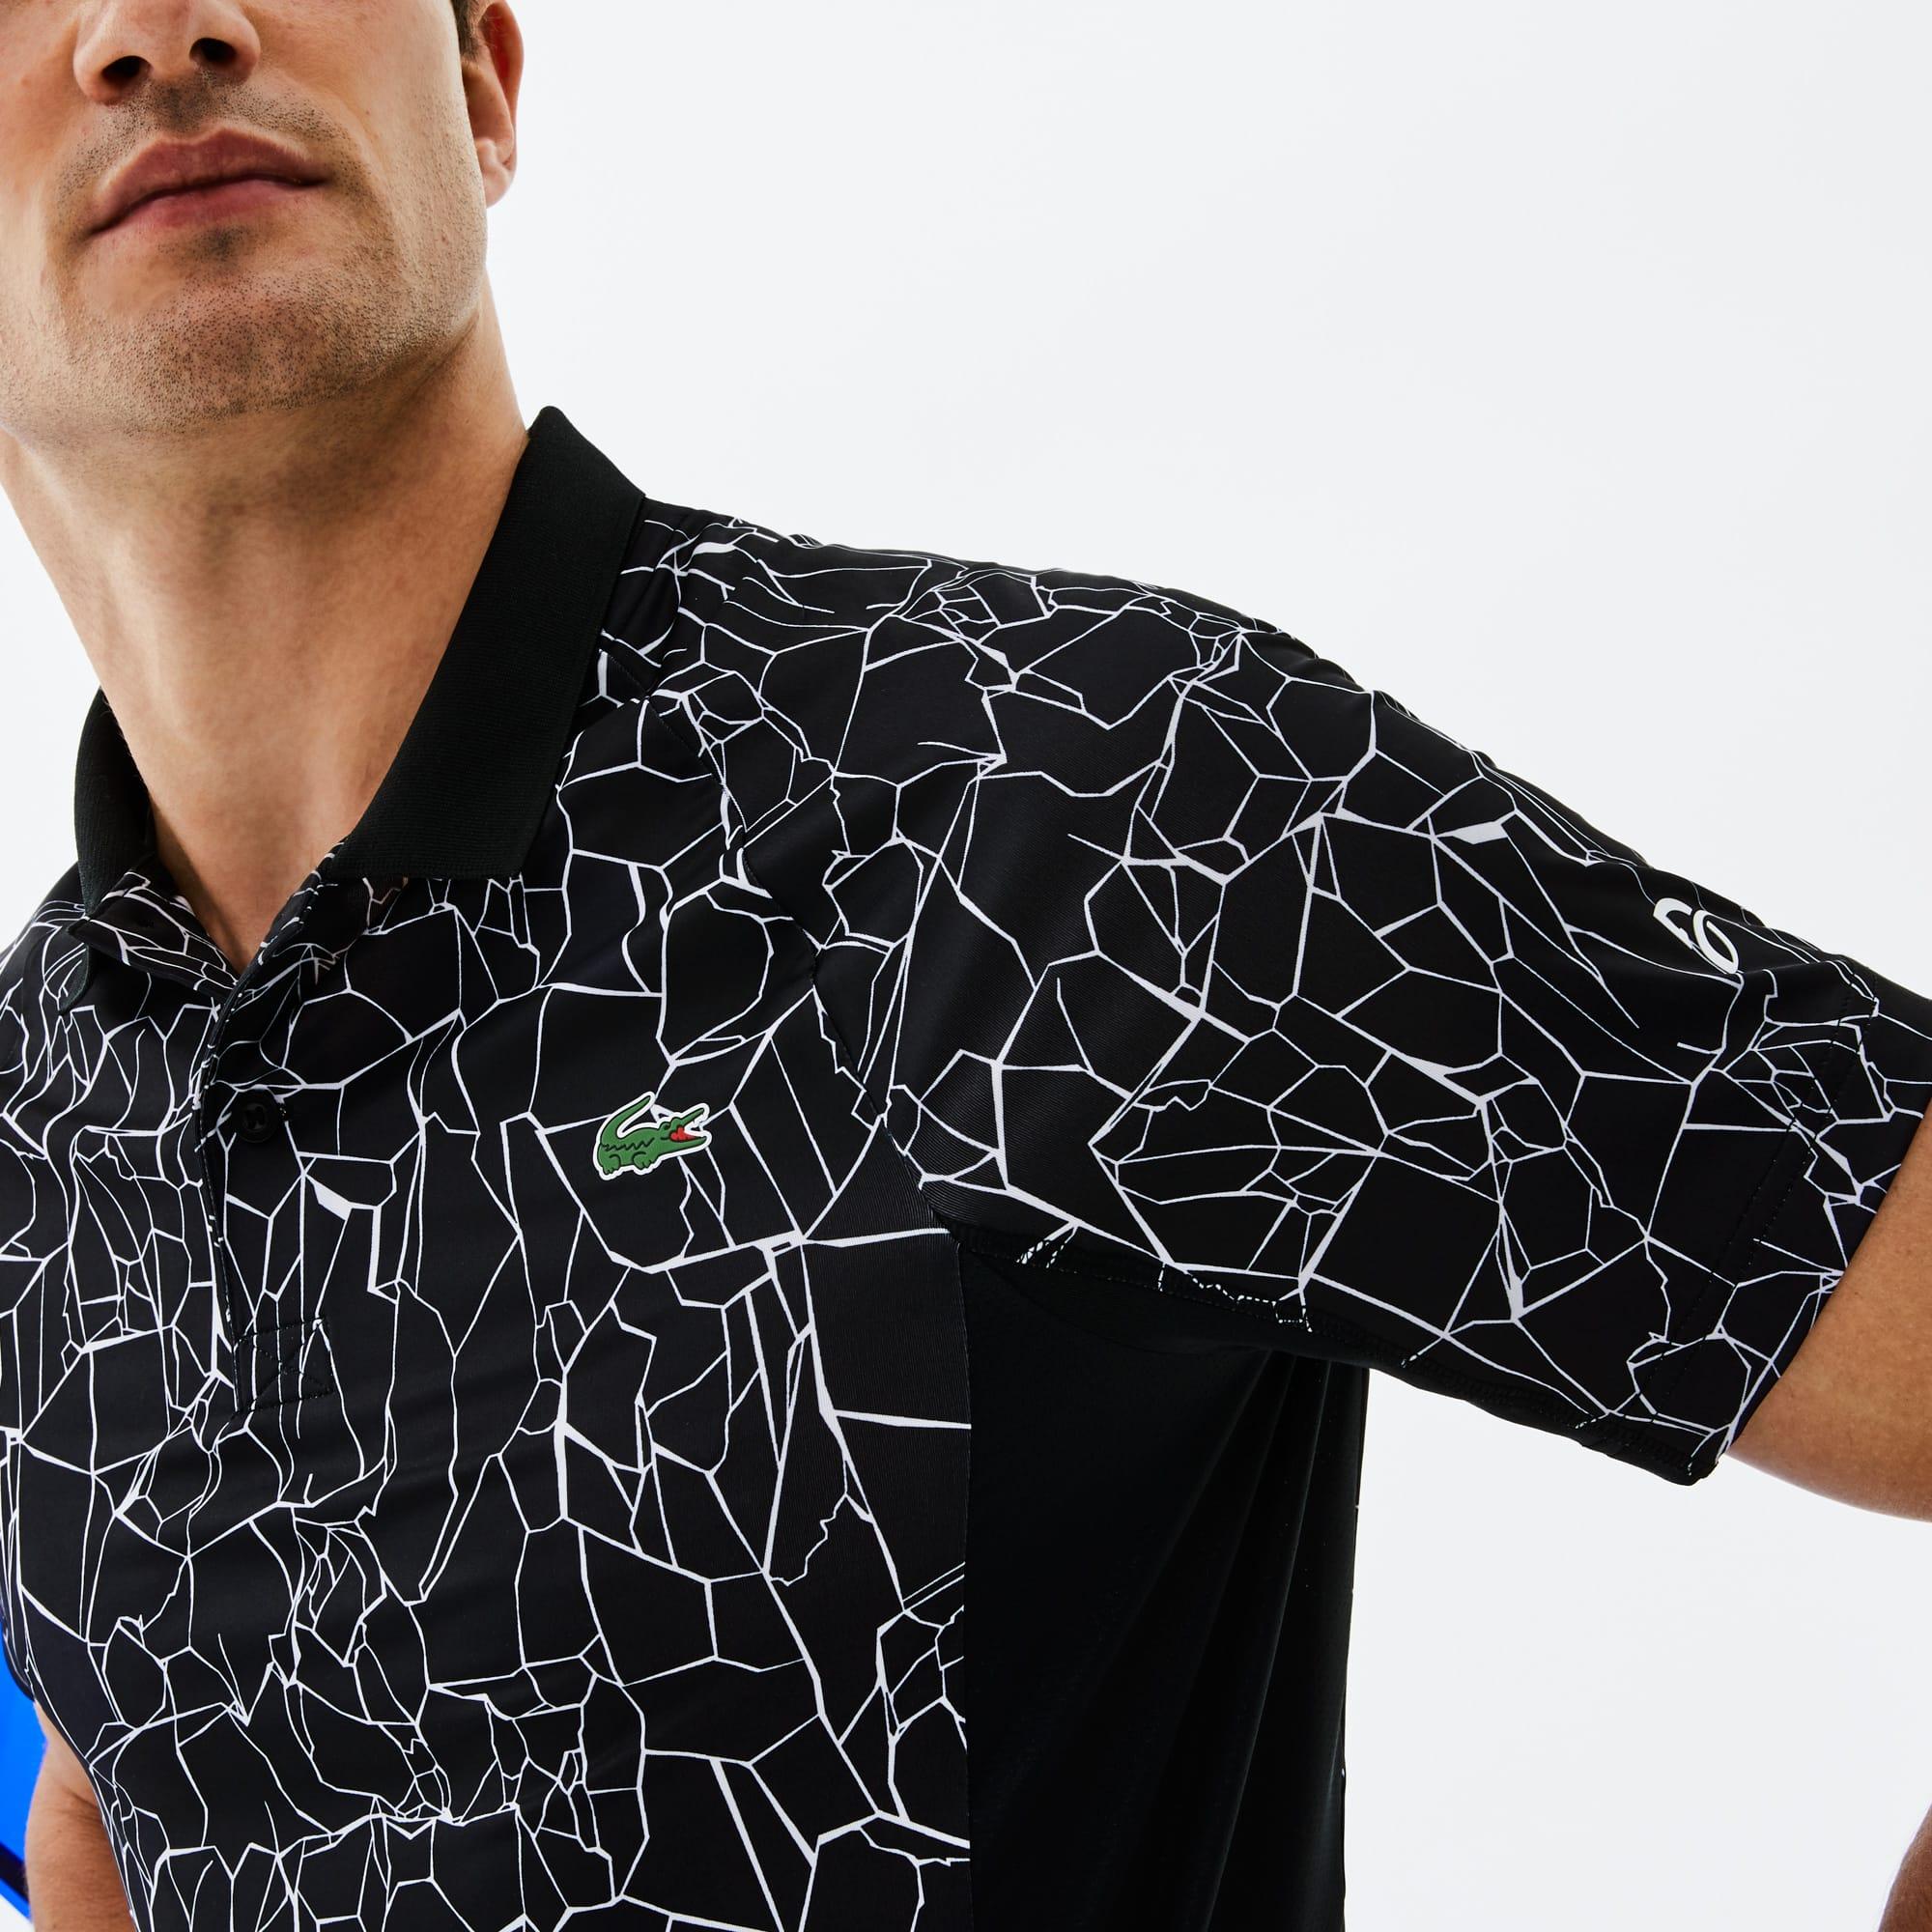 519126d2 Men's SPORT Print Technical Jersey Polo - Lacoste x Novak Djokovic ...